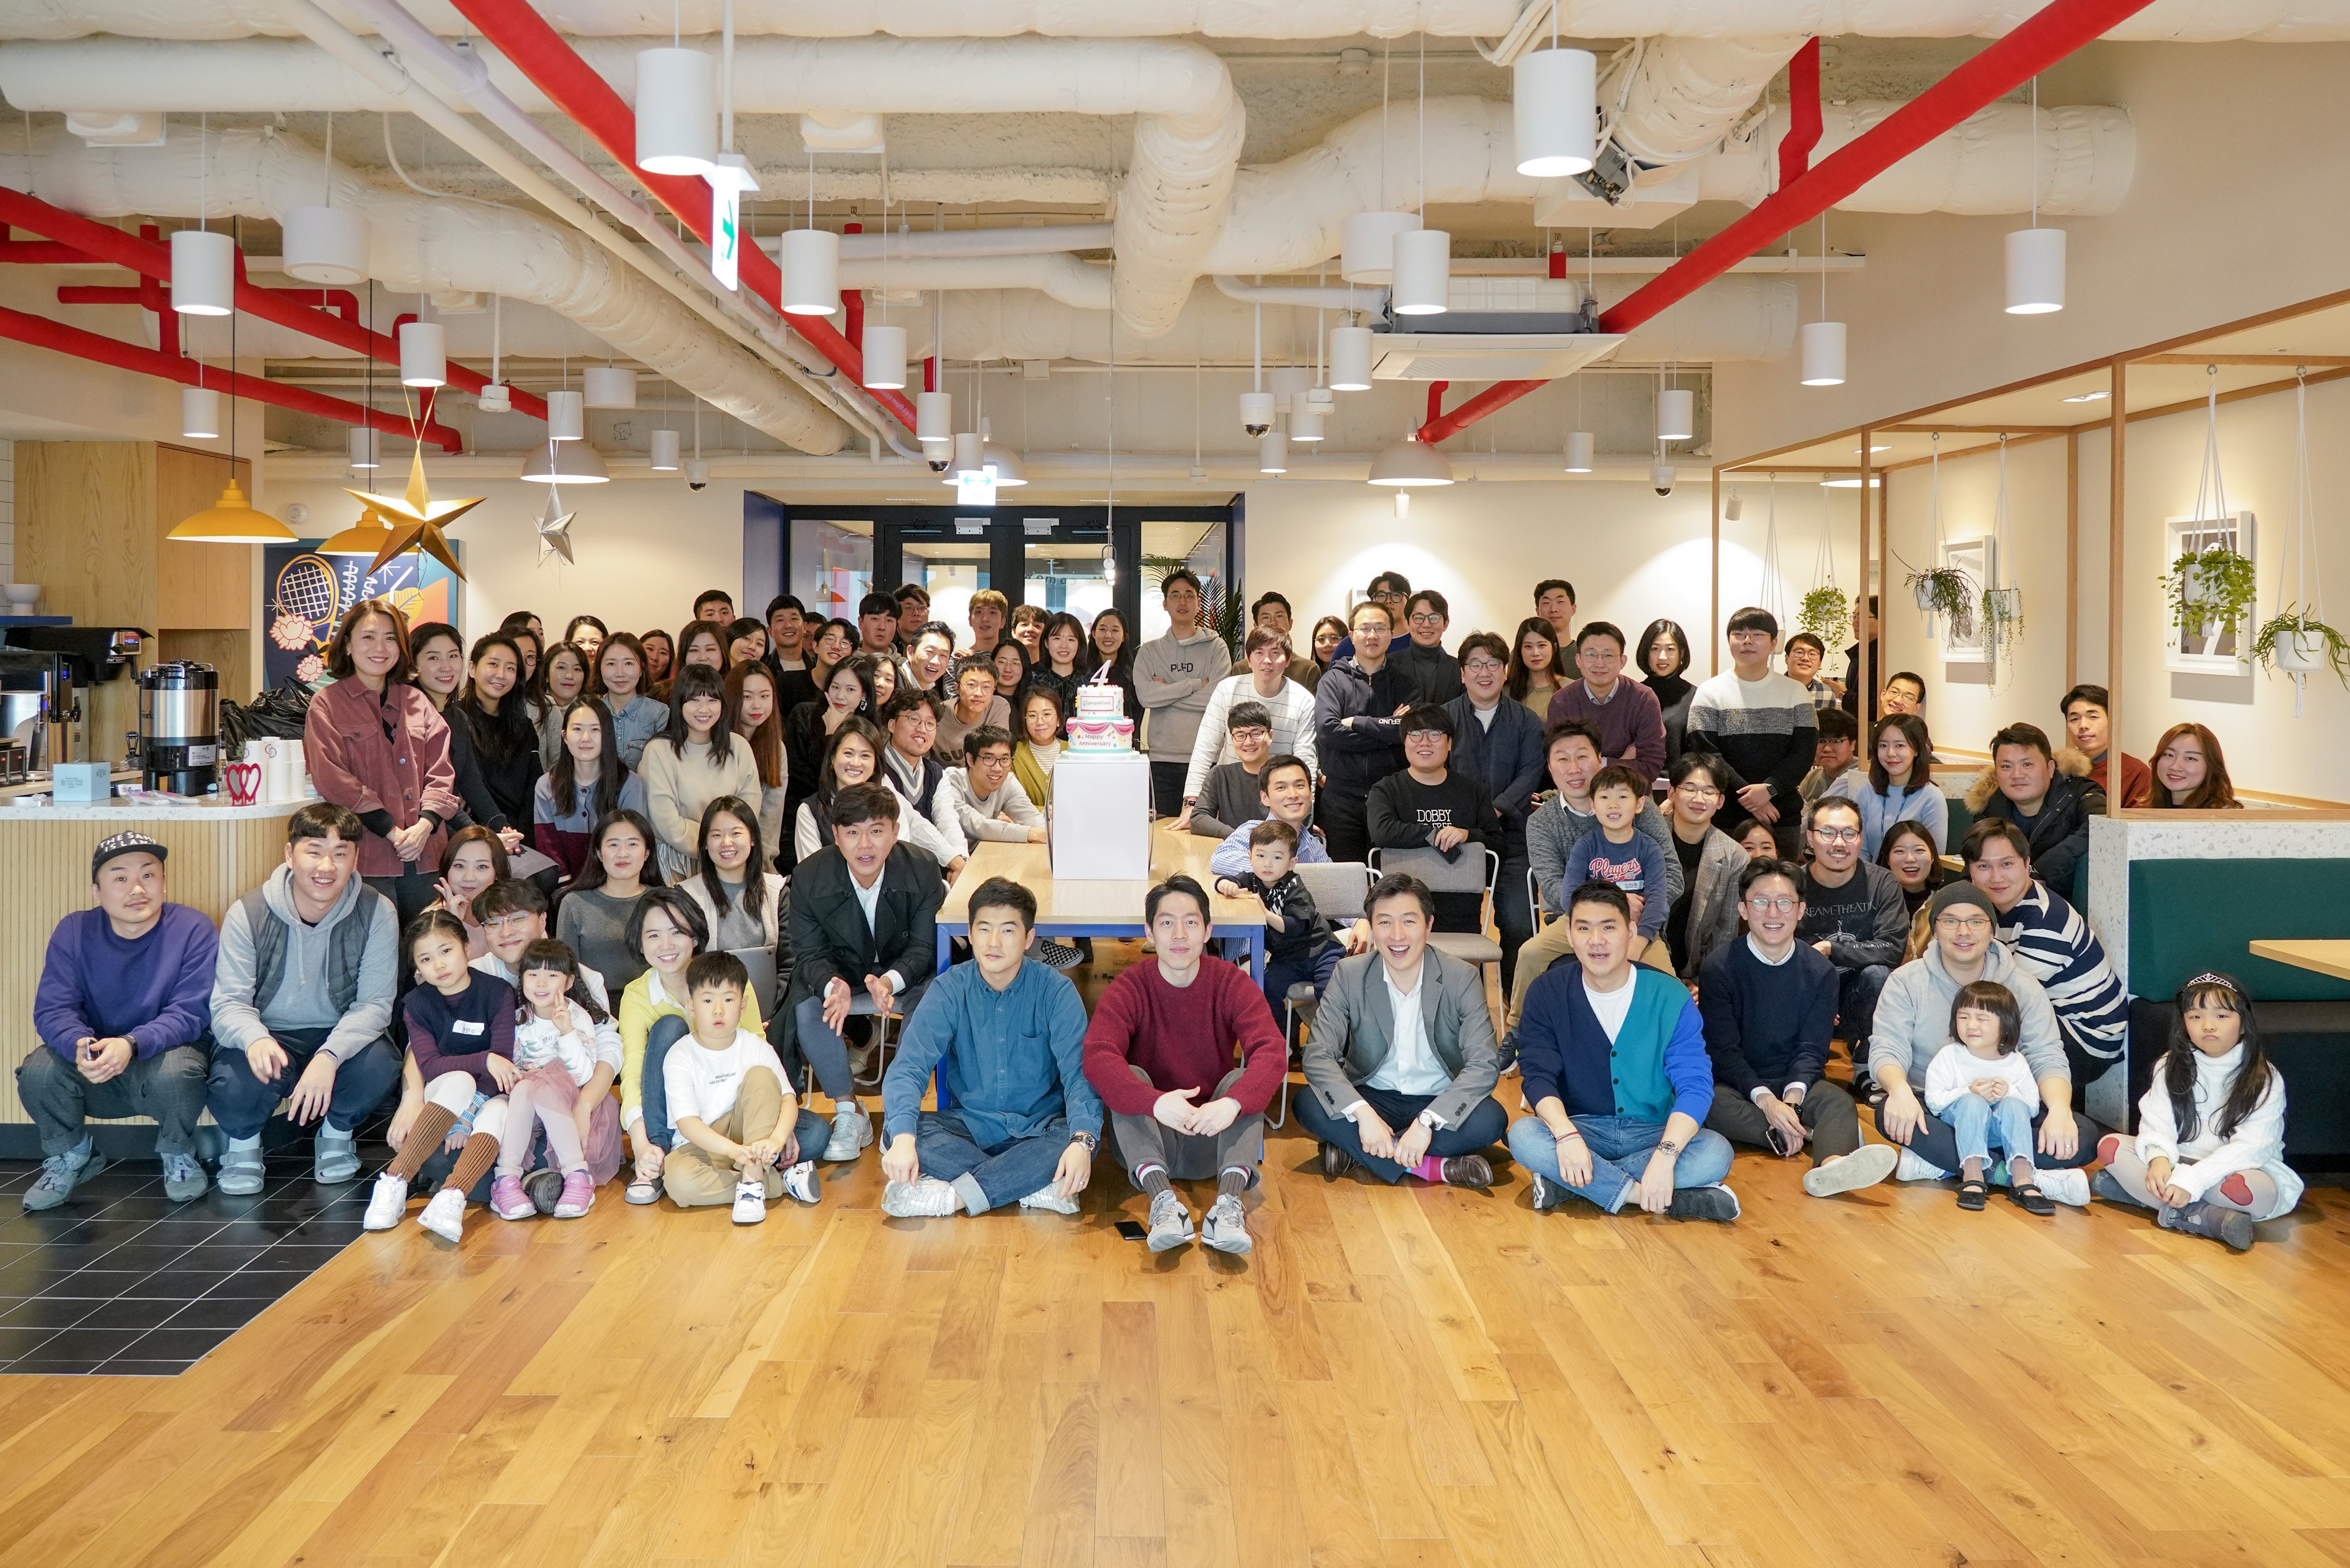 Korean lending startup secures $35m in debt, equity financing